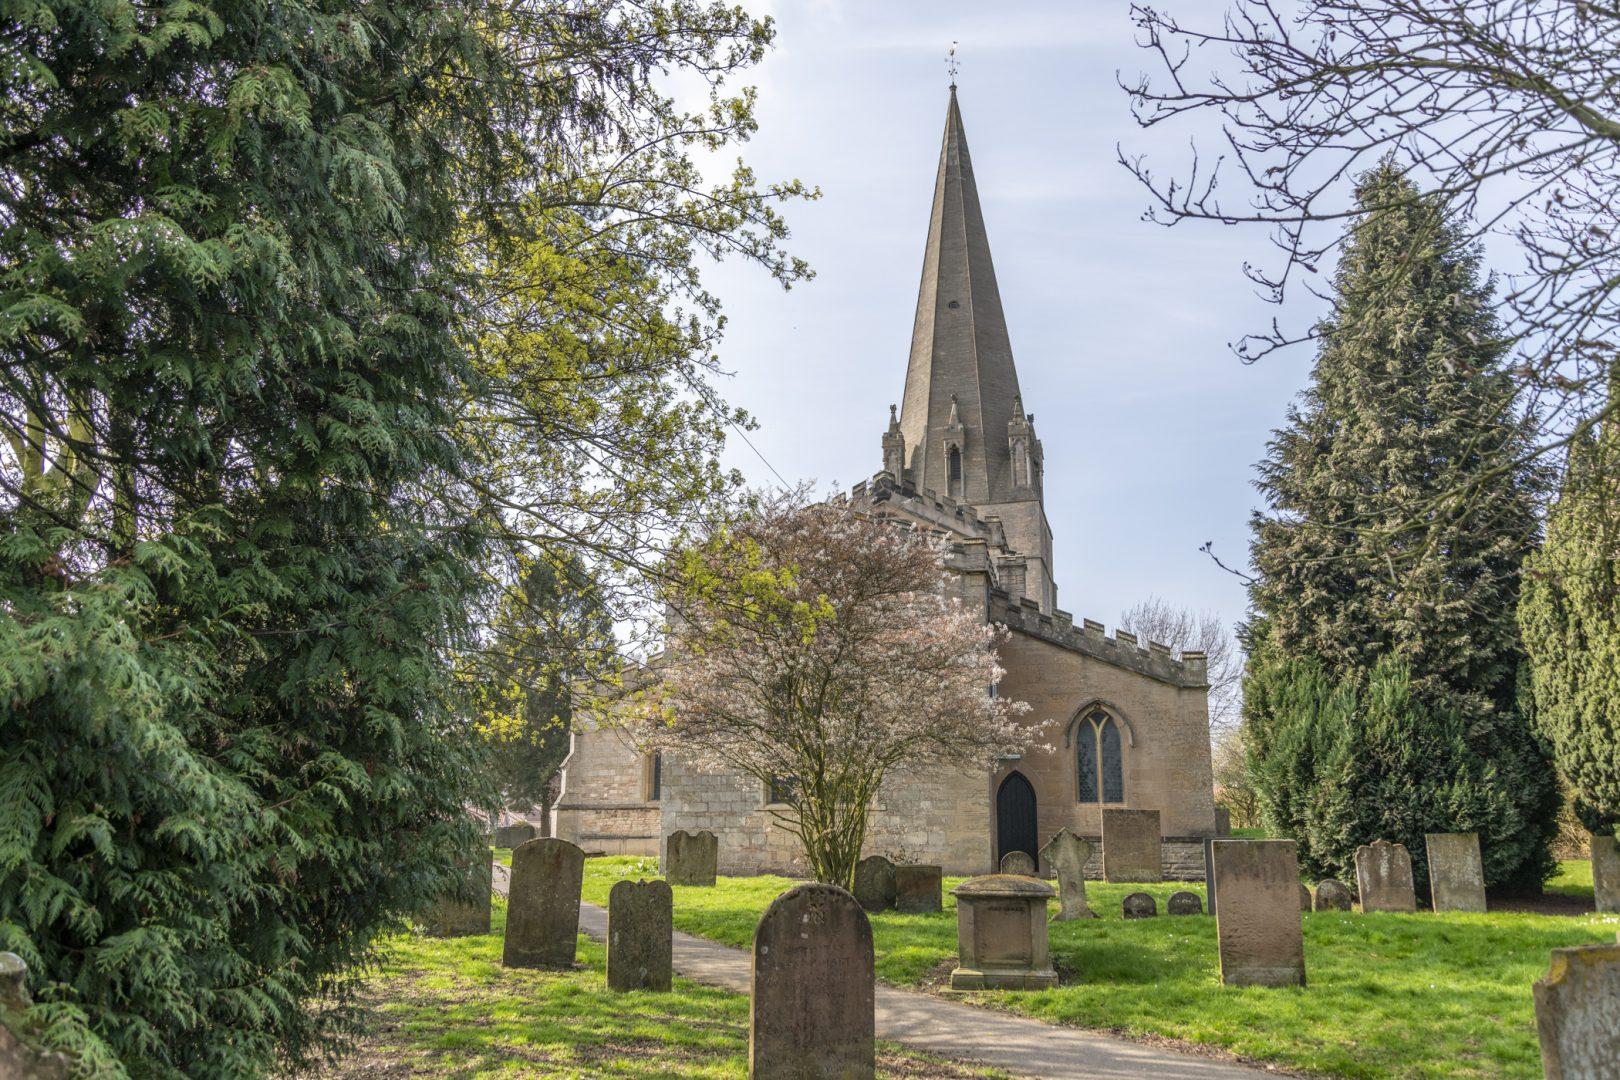 St Mary's Church in Edwinstowe